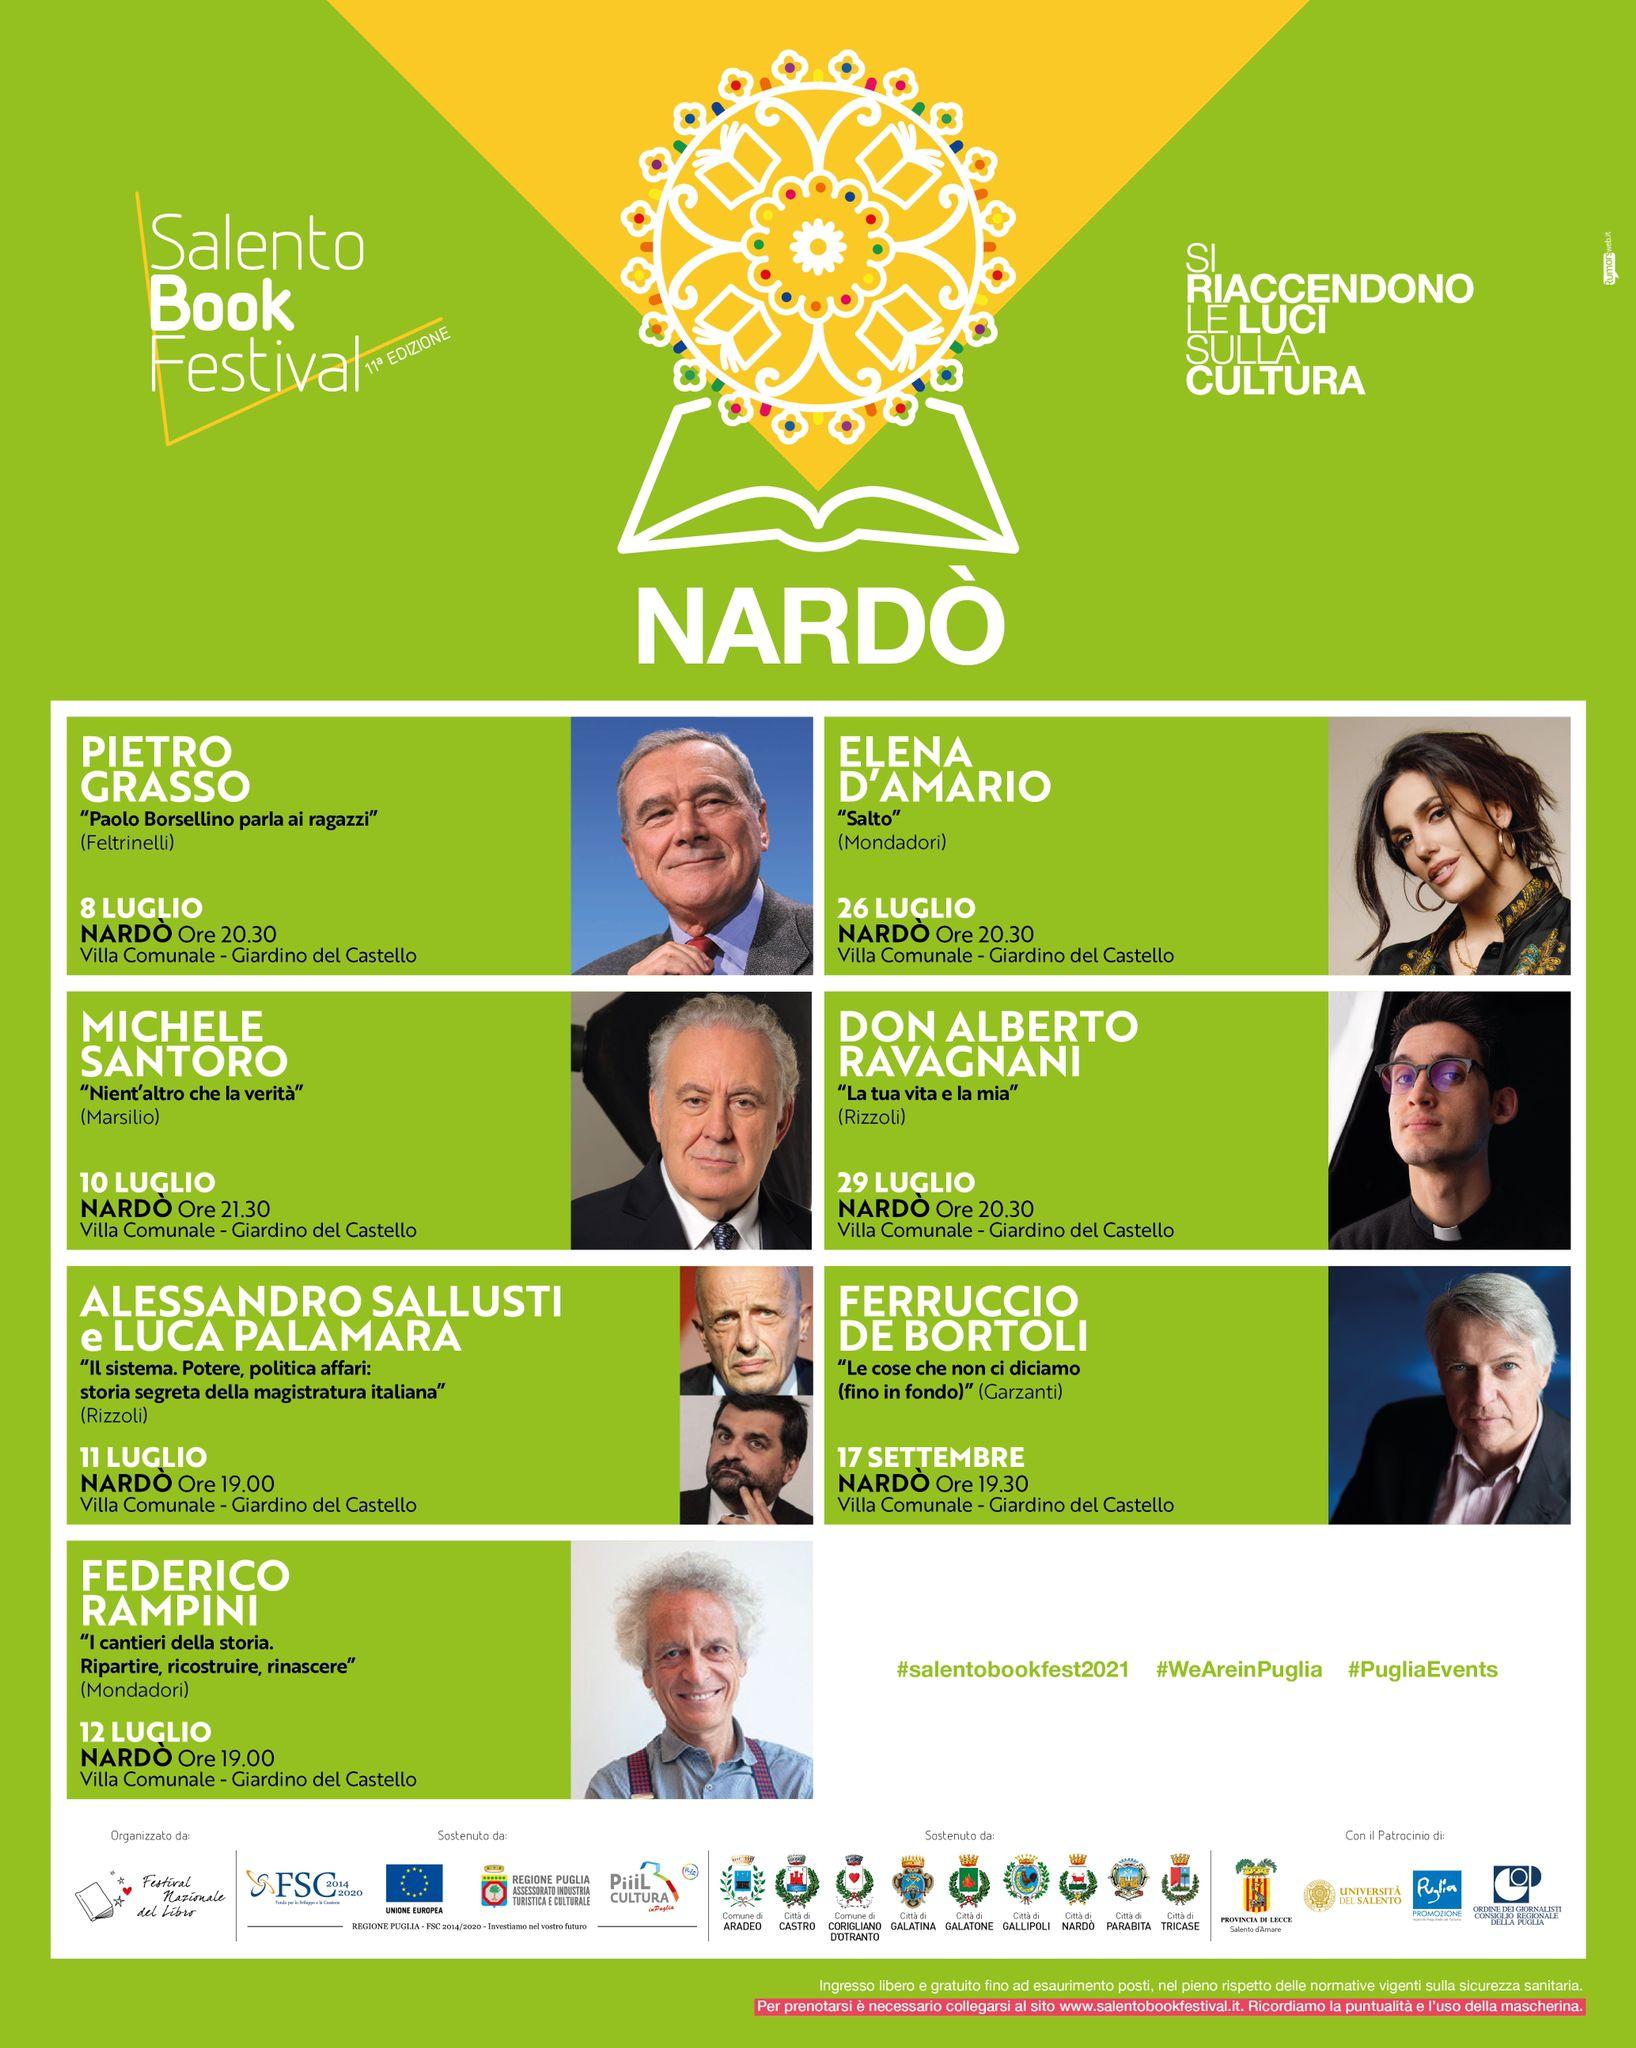 salento book festival